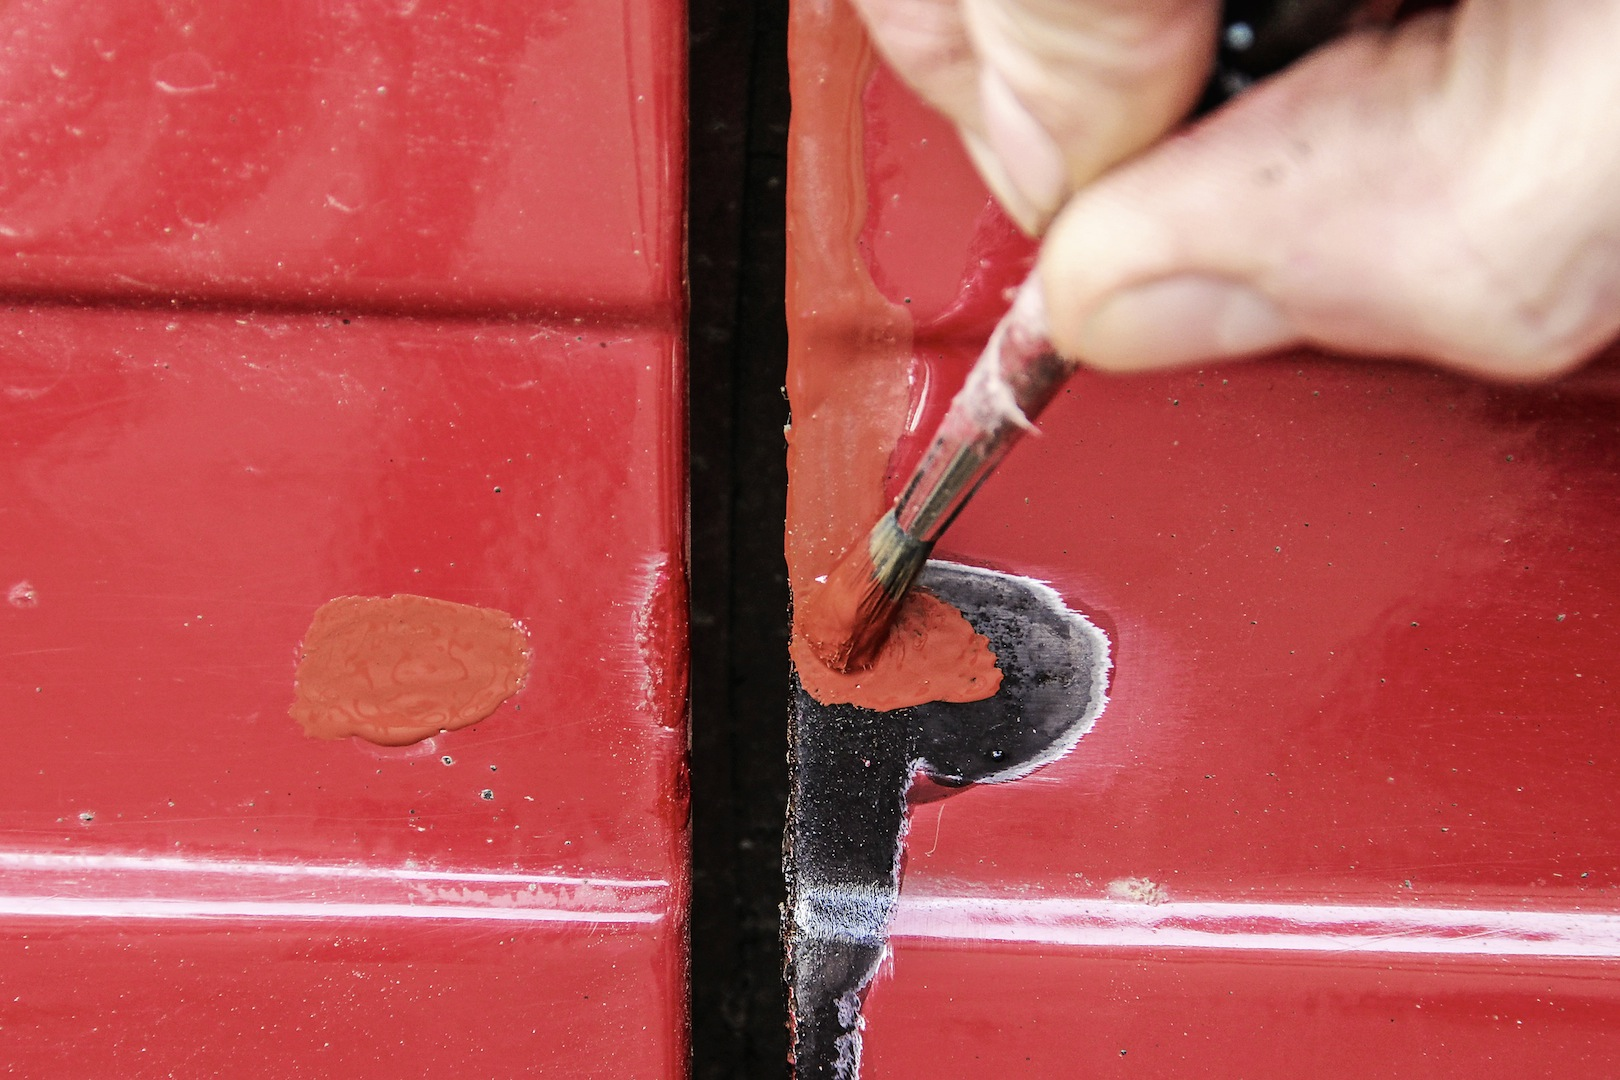 touching up damaged paint